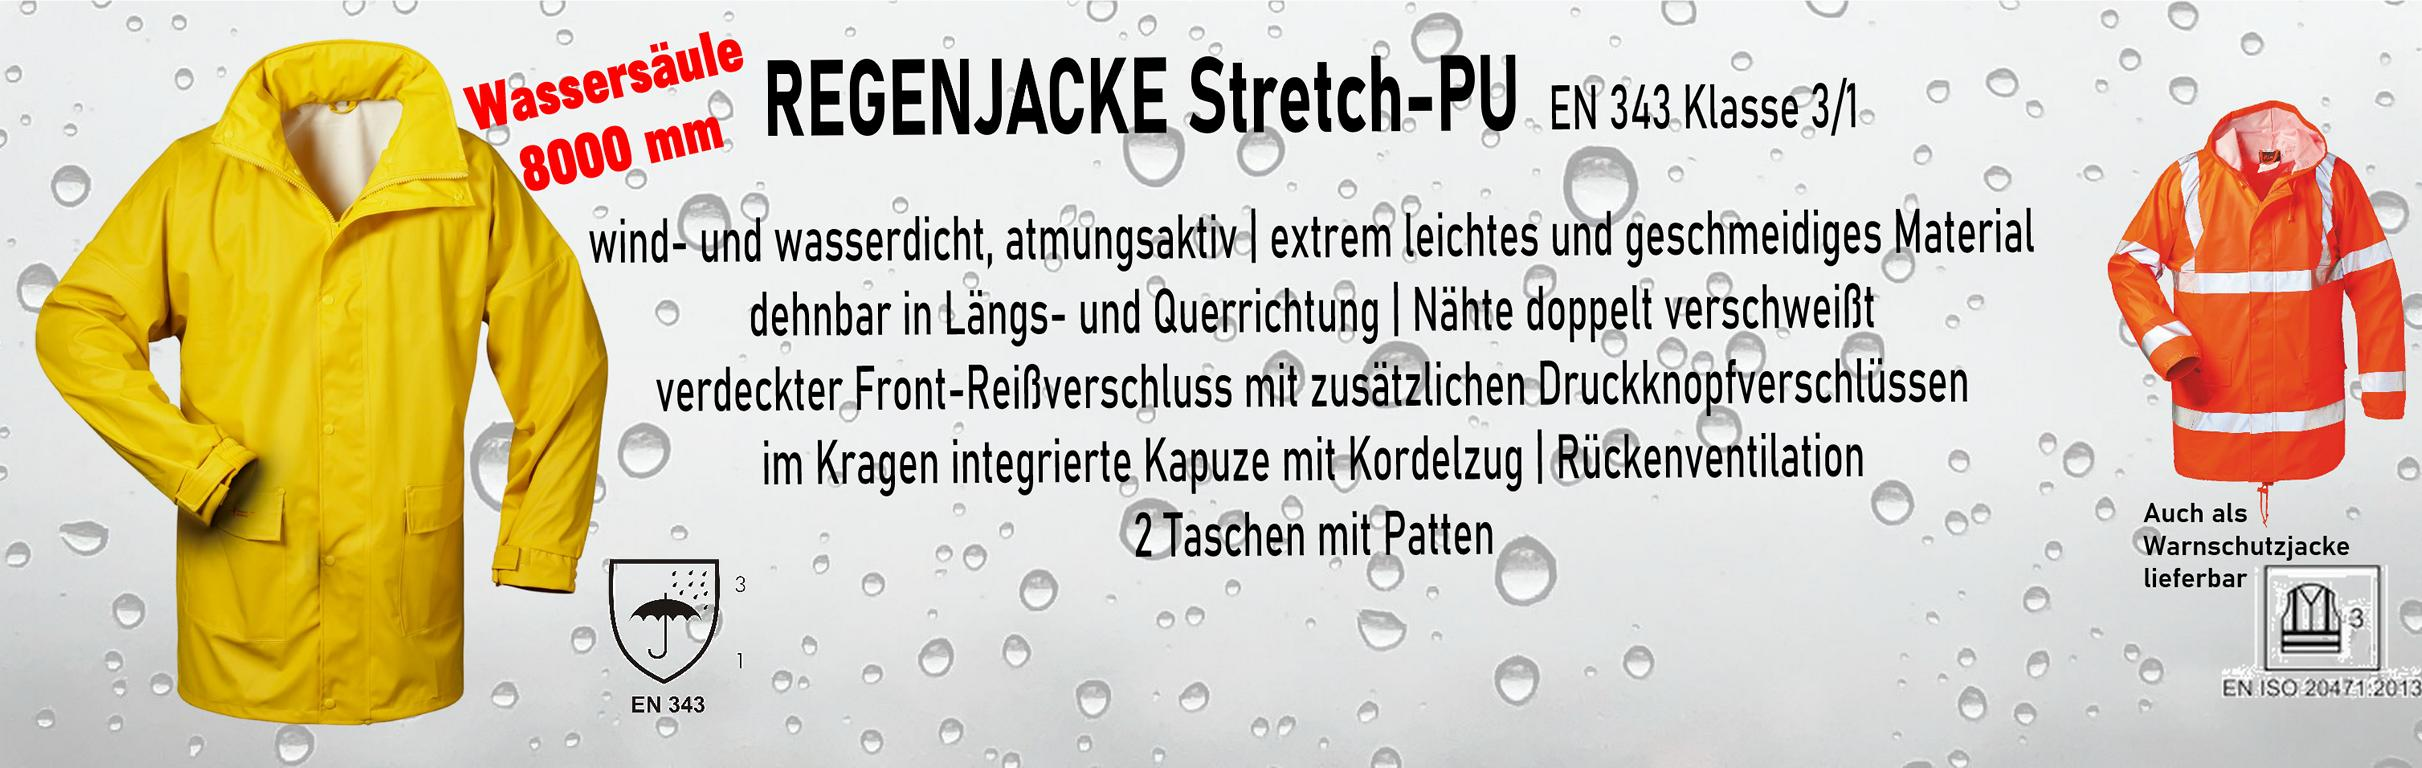 Regenjacken Stretch-PU    ab € 18,95